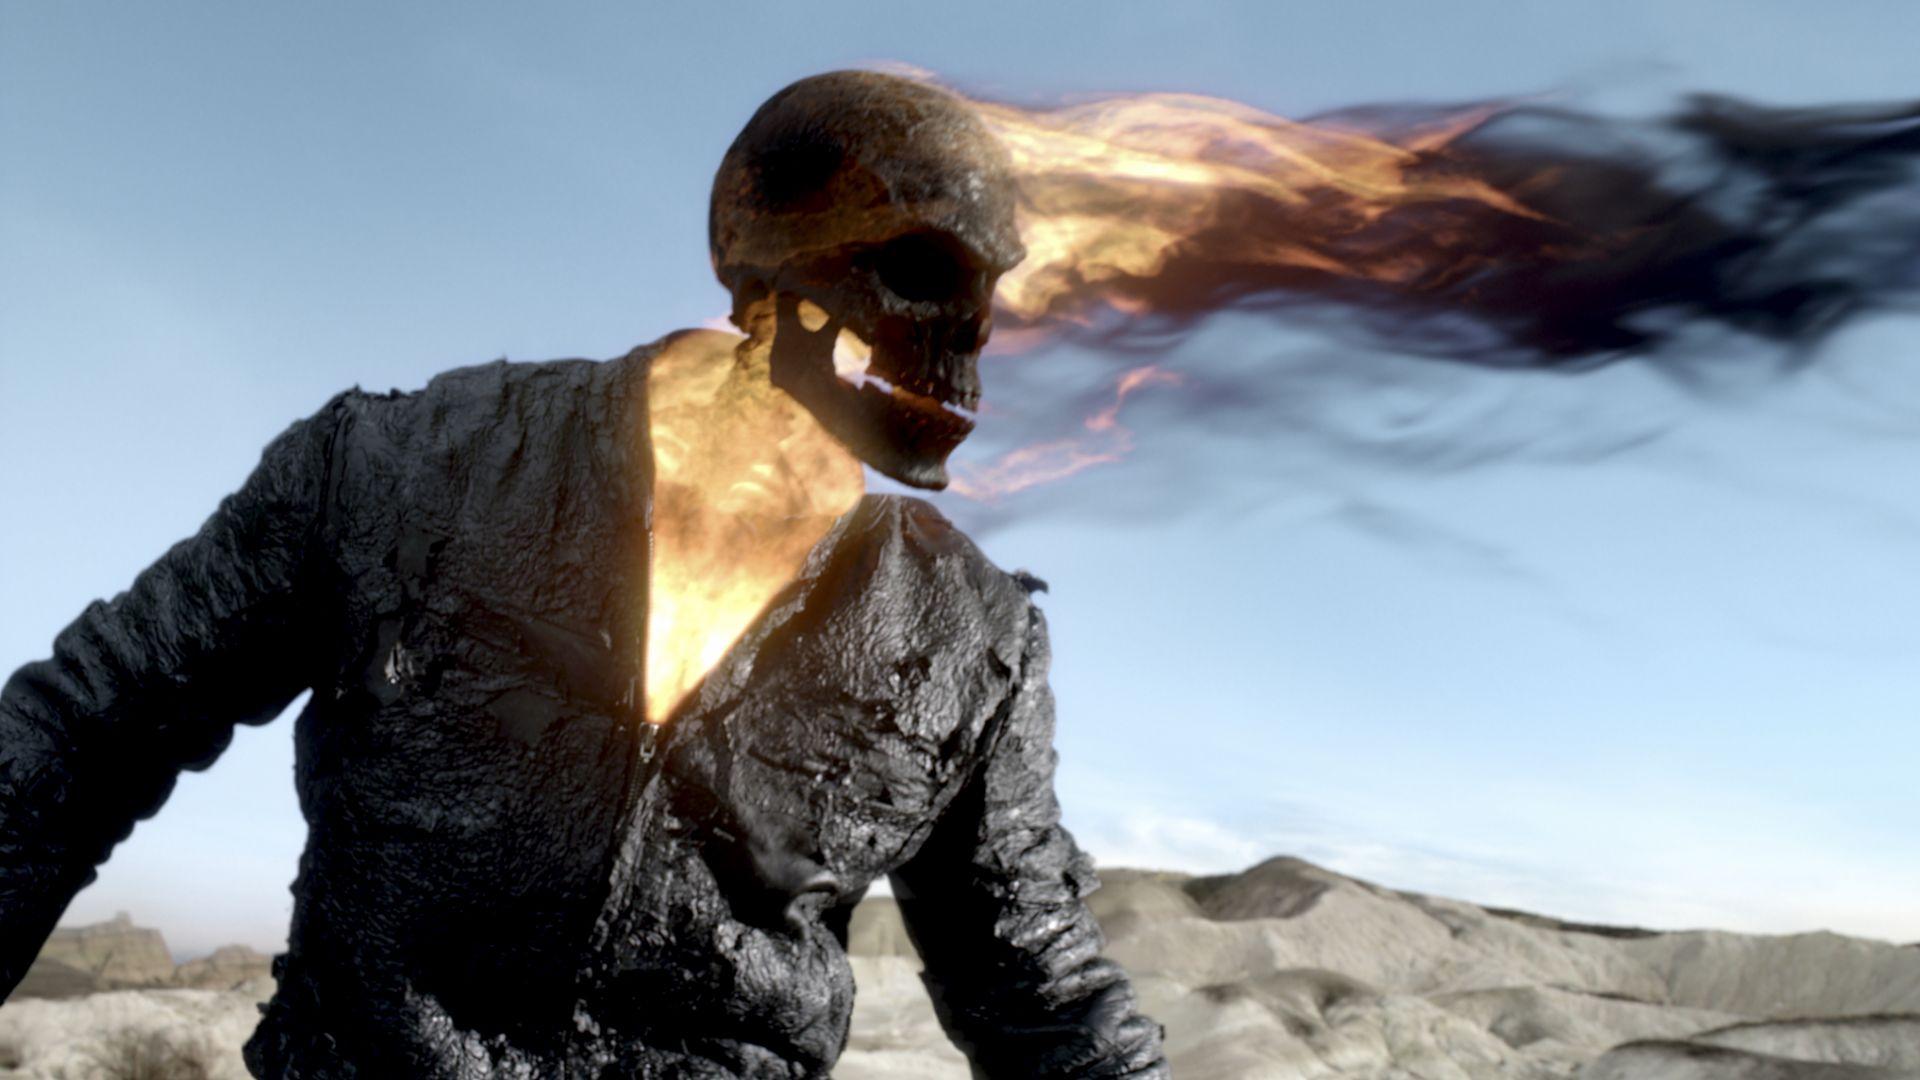 Ghost Rider/Johnny Blaze